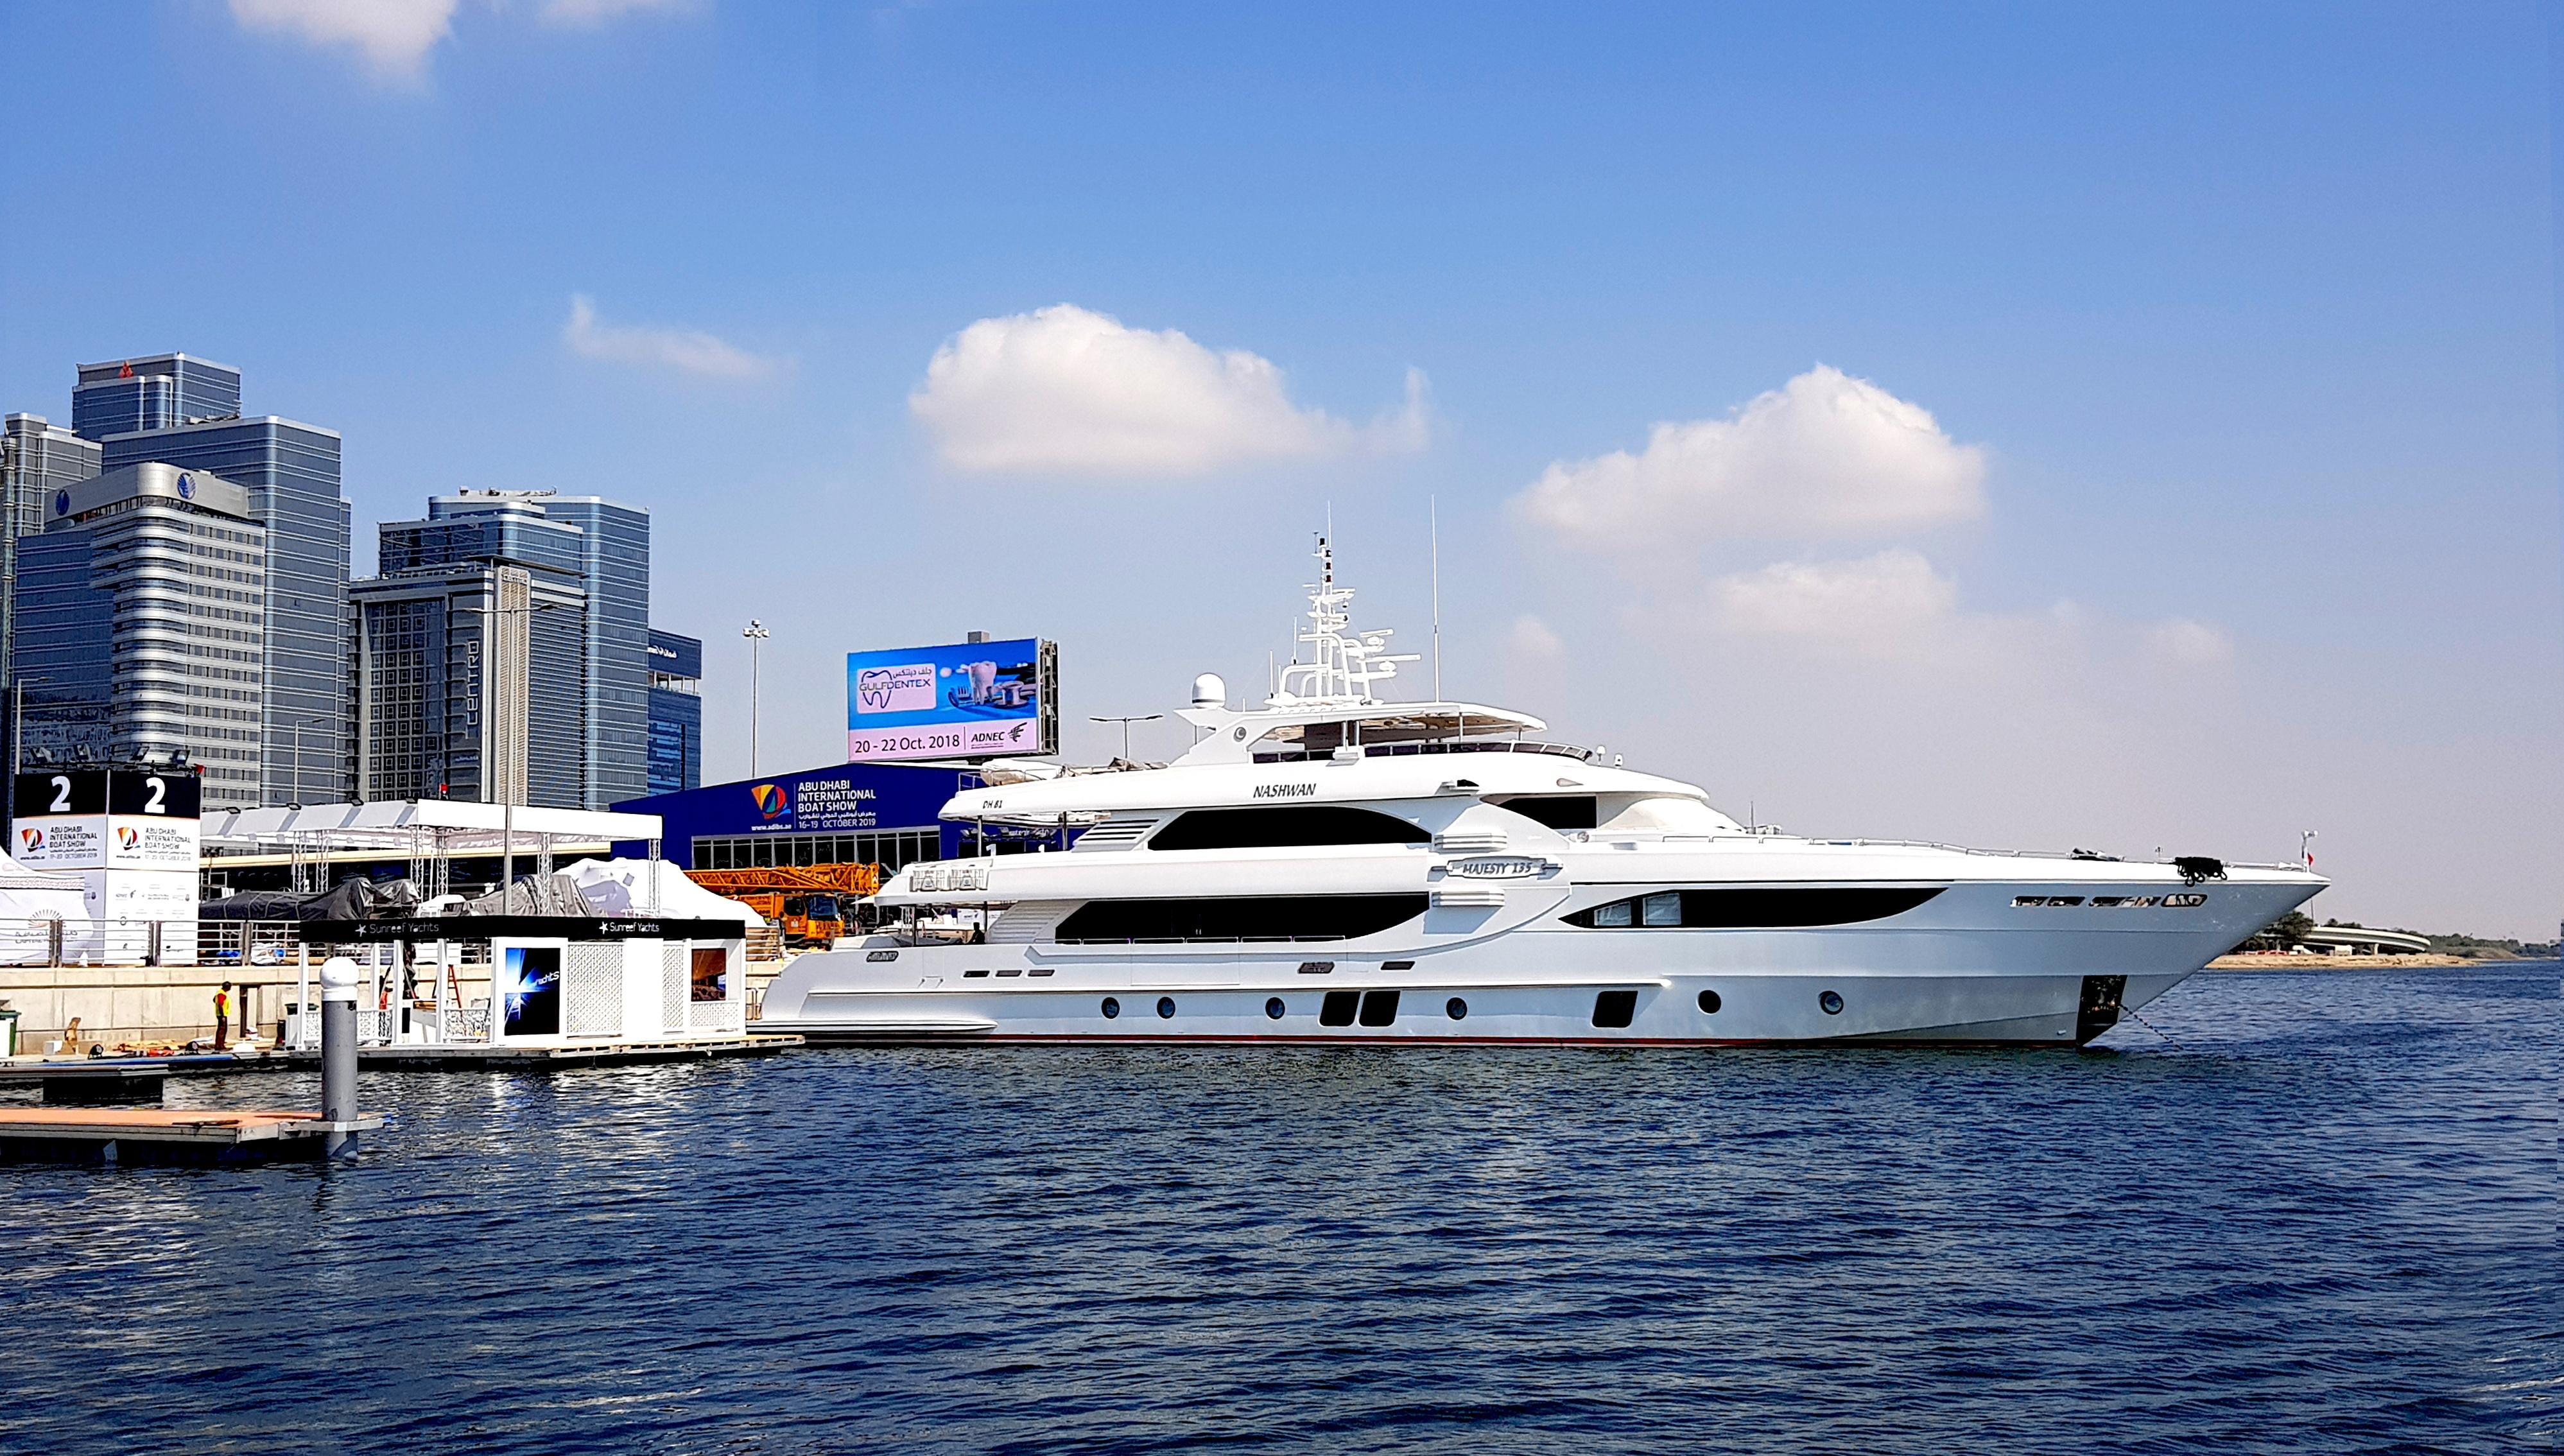 Majesty 135 Present at the Abu Dhabi International Boat Show 2018